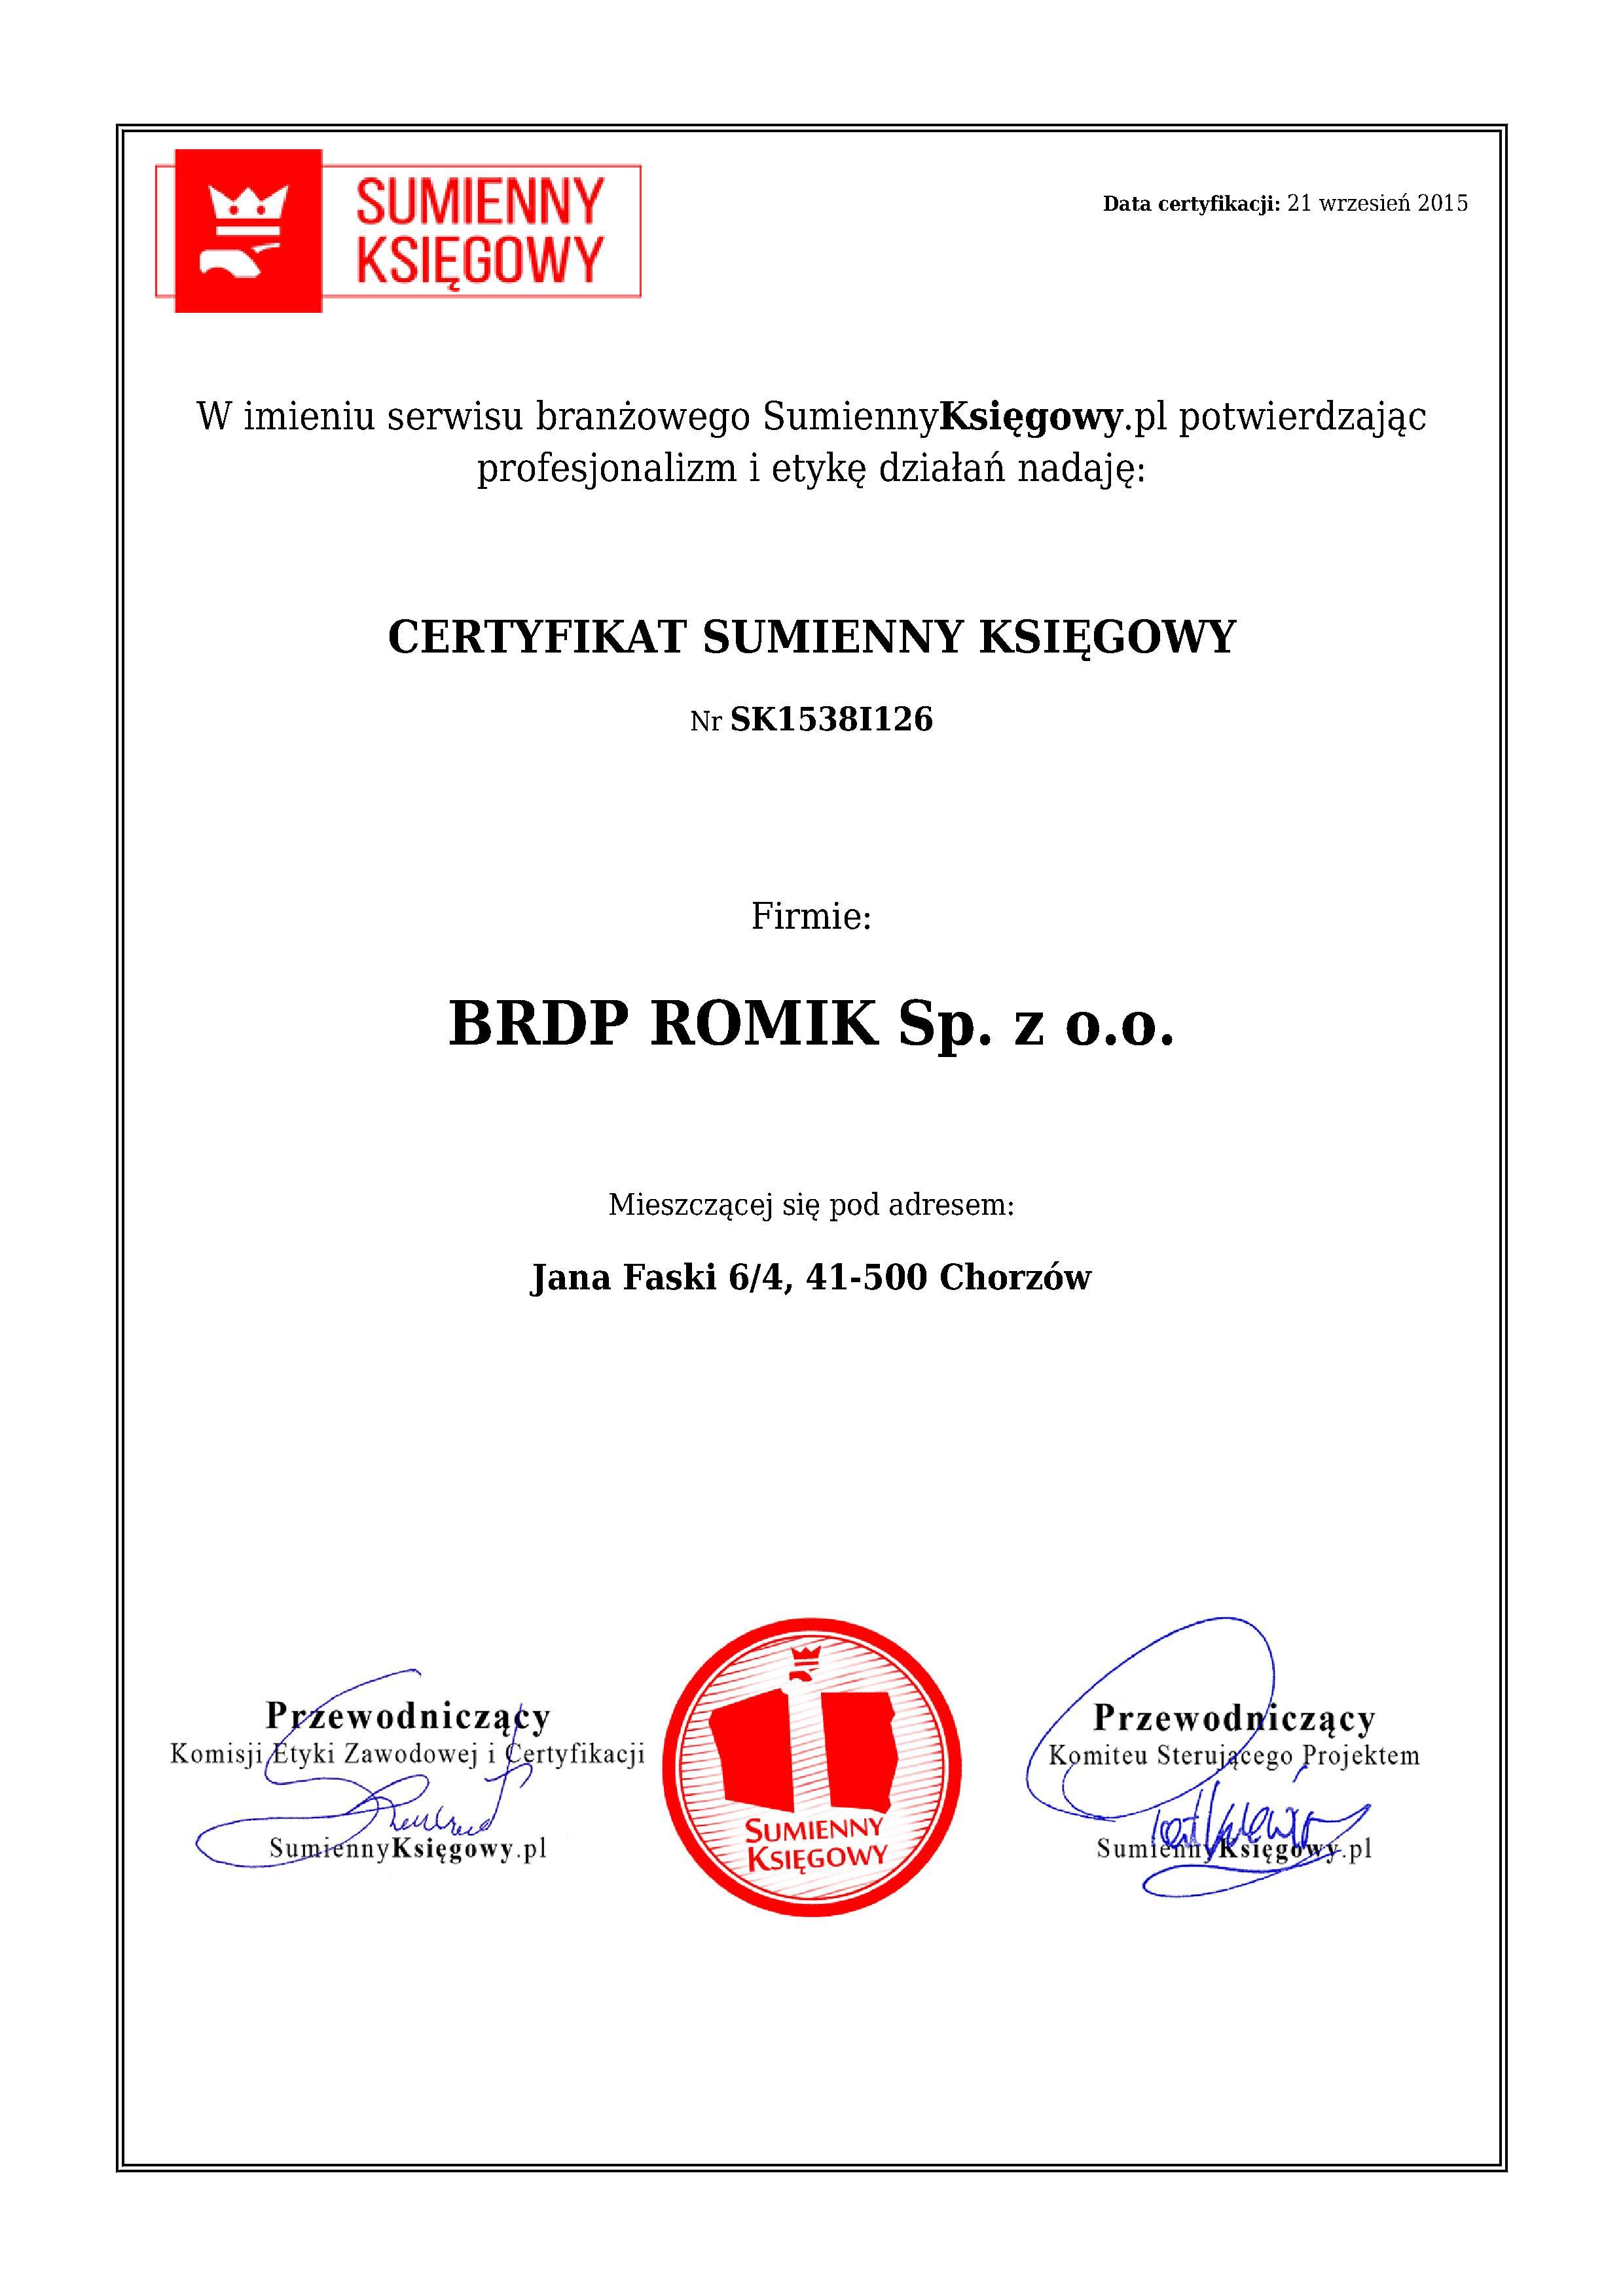 Certyfikat BRDP ROMIK Sp. z o.o.